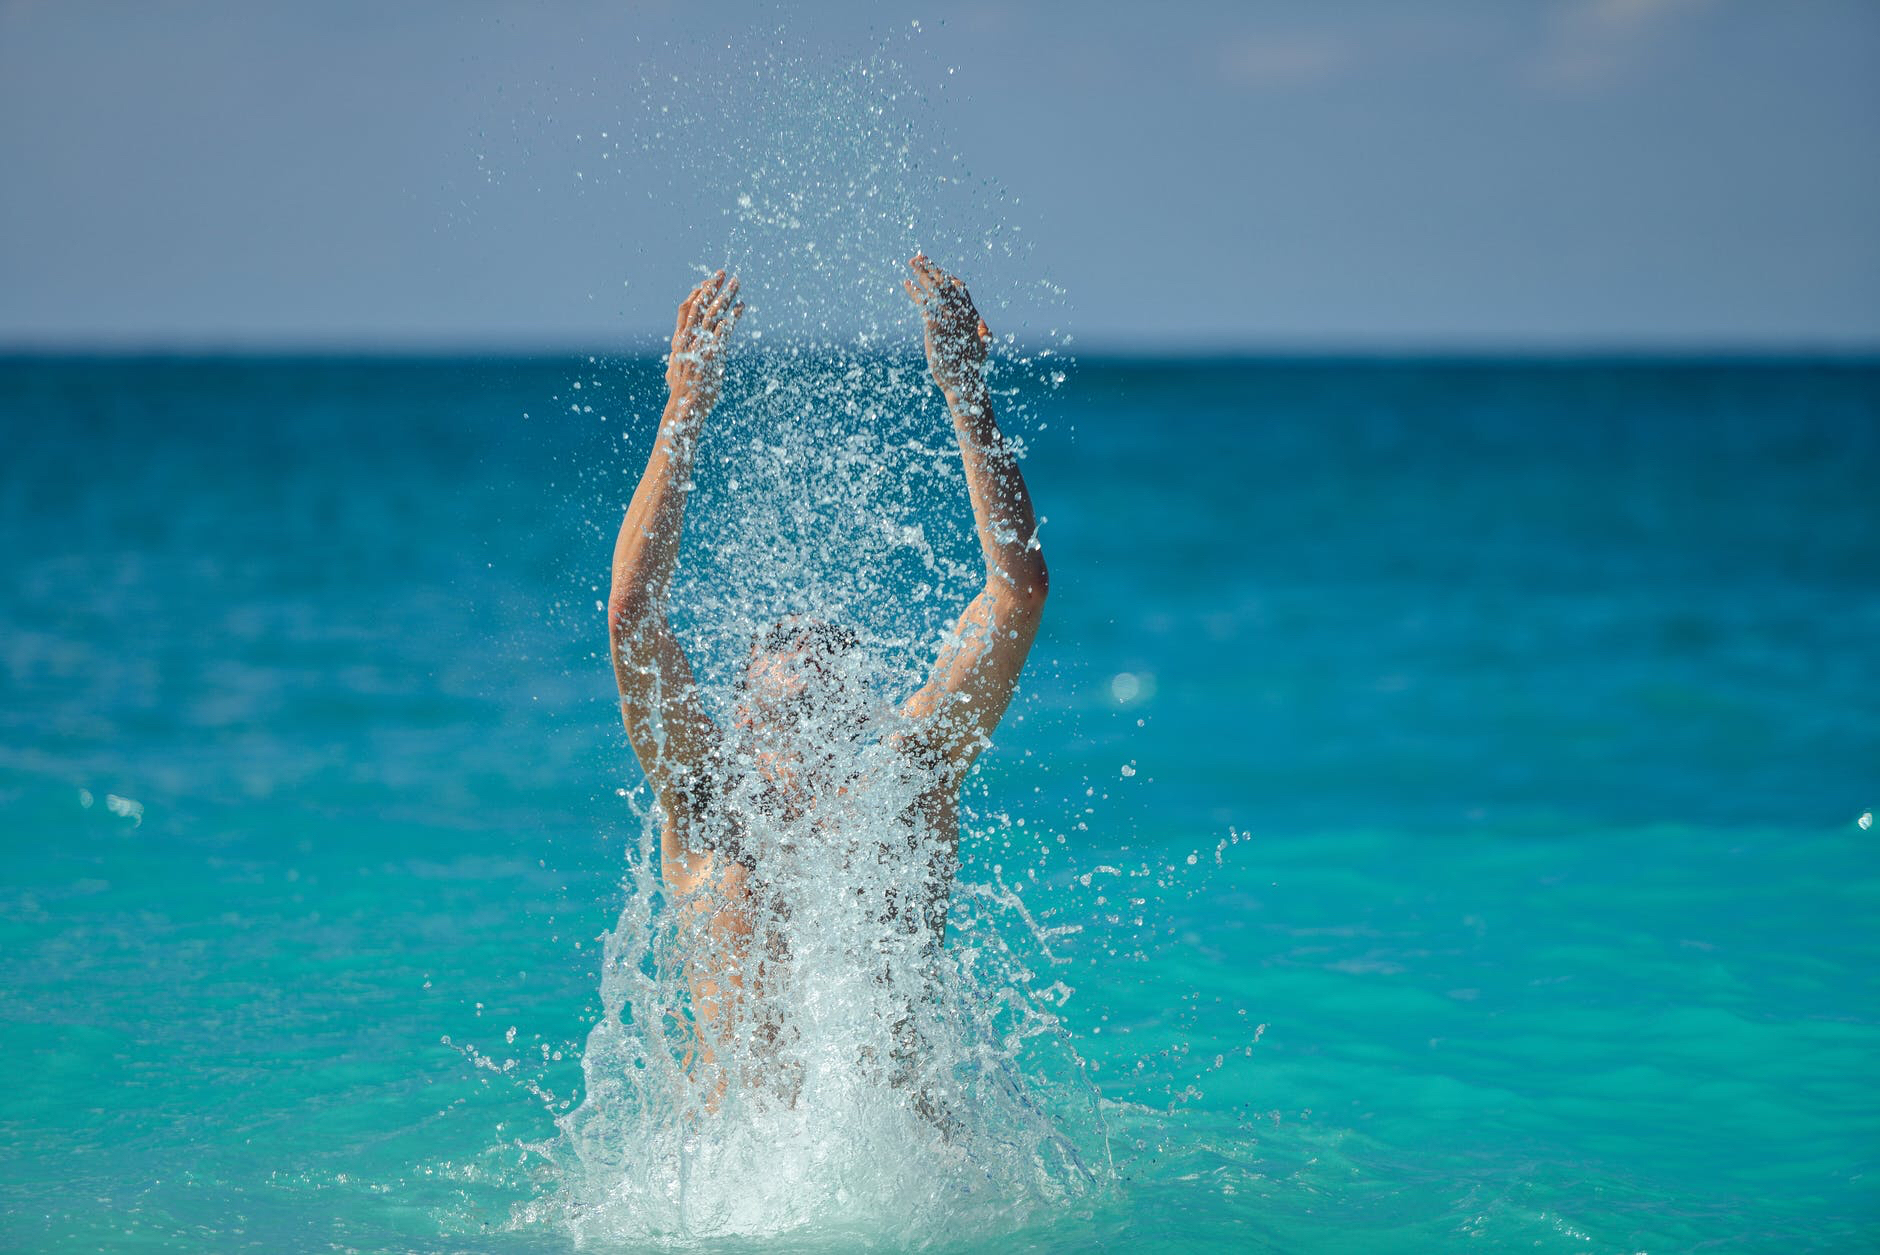 sea-man-person-holiday